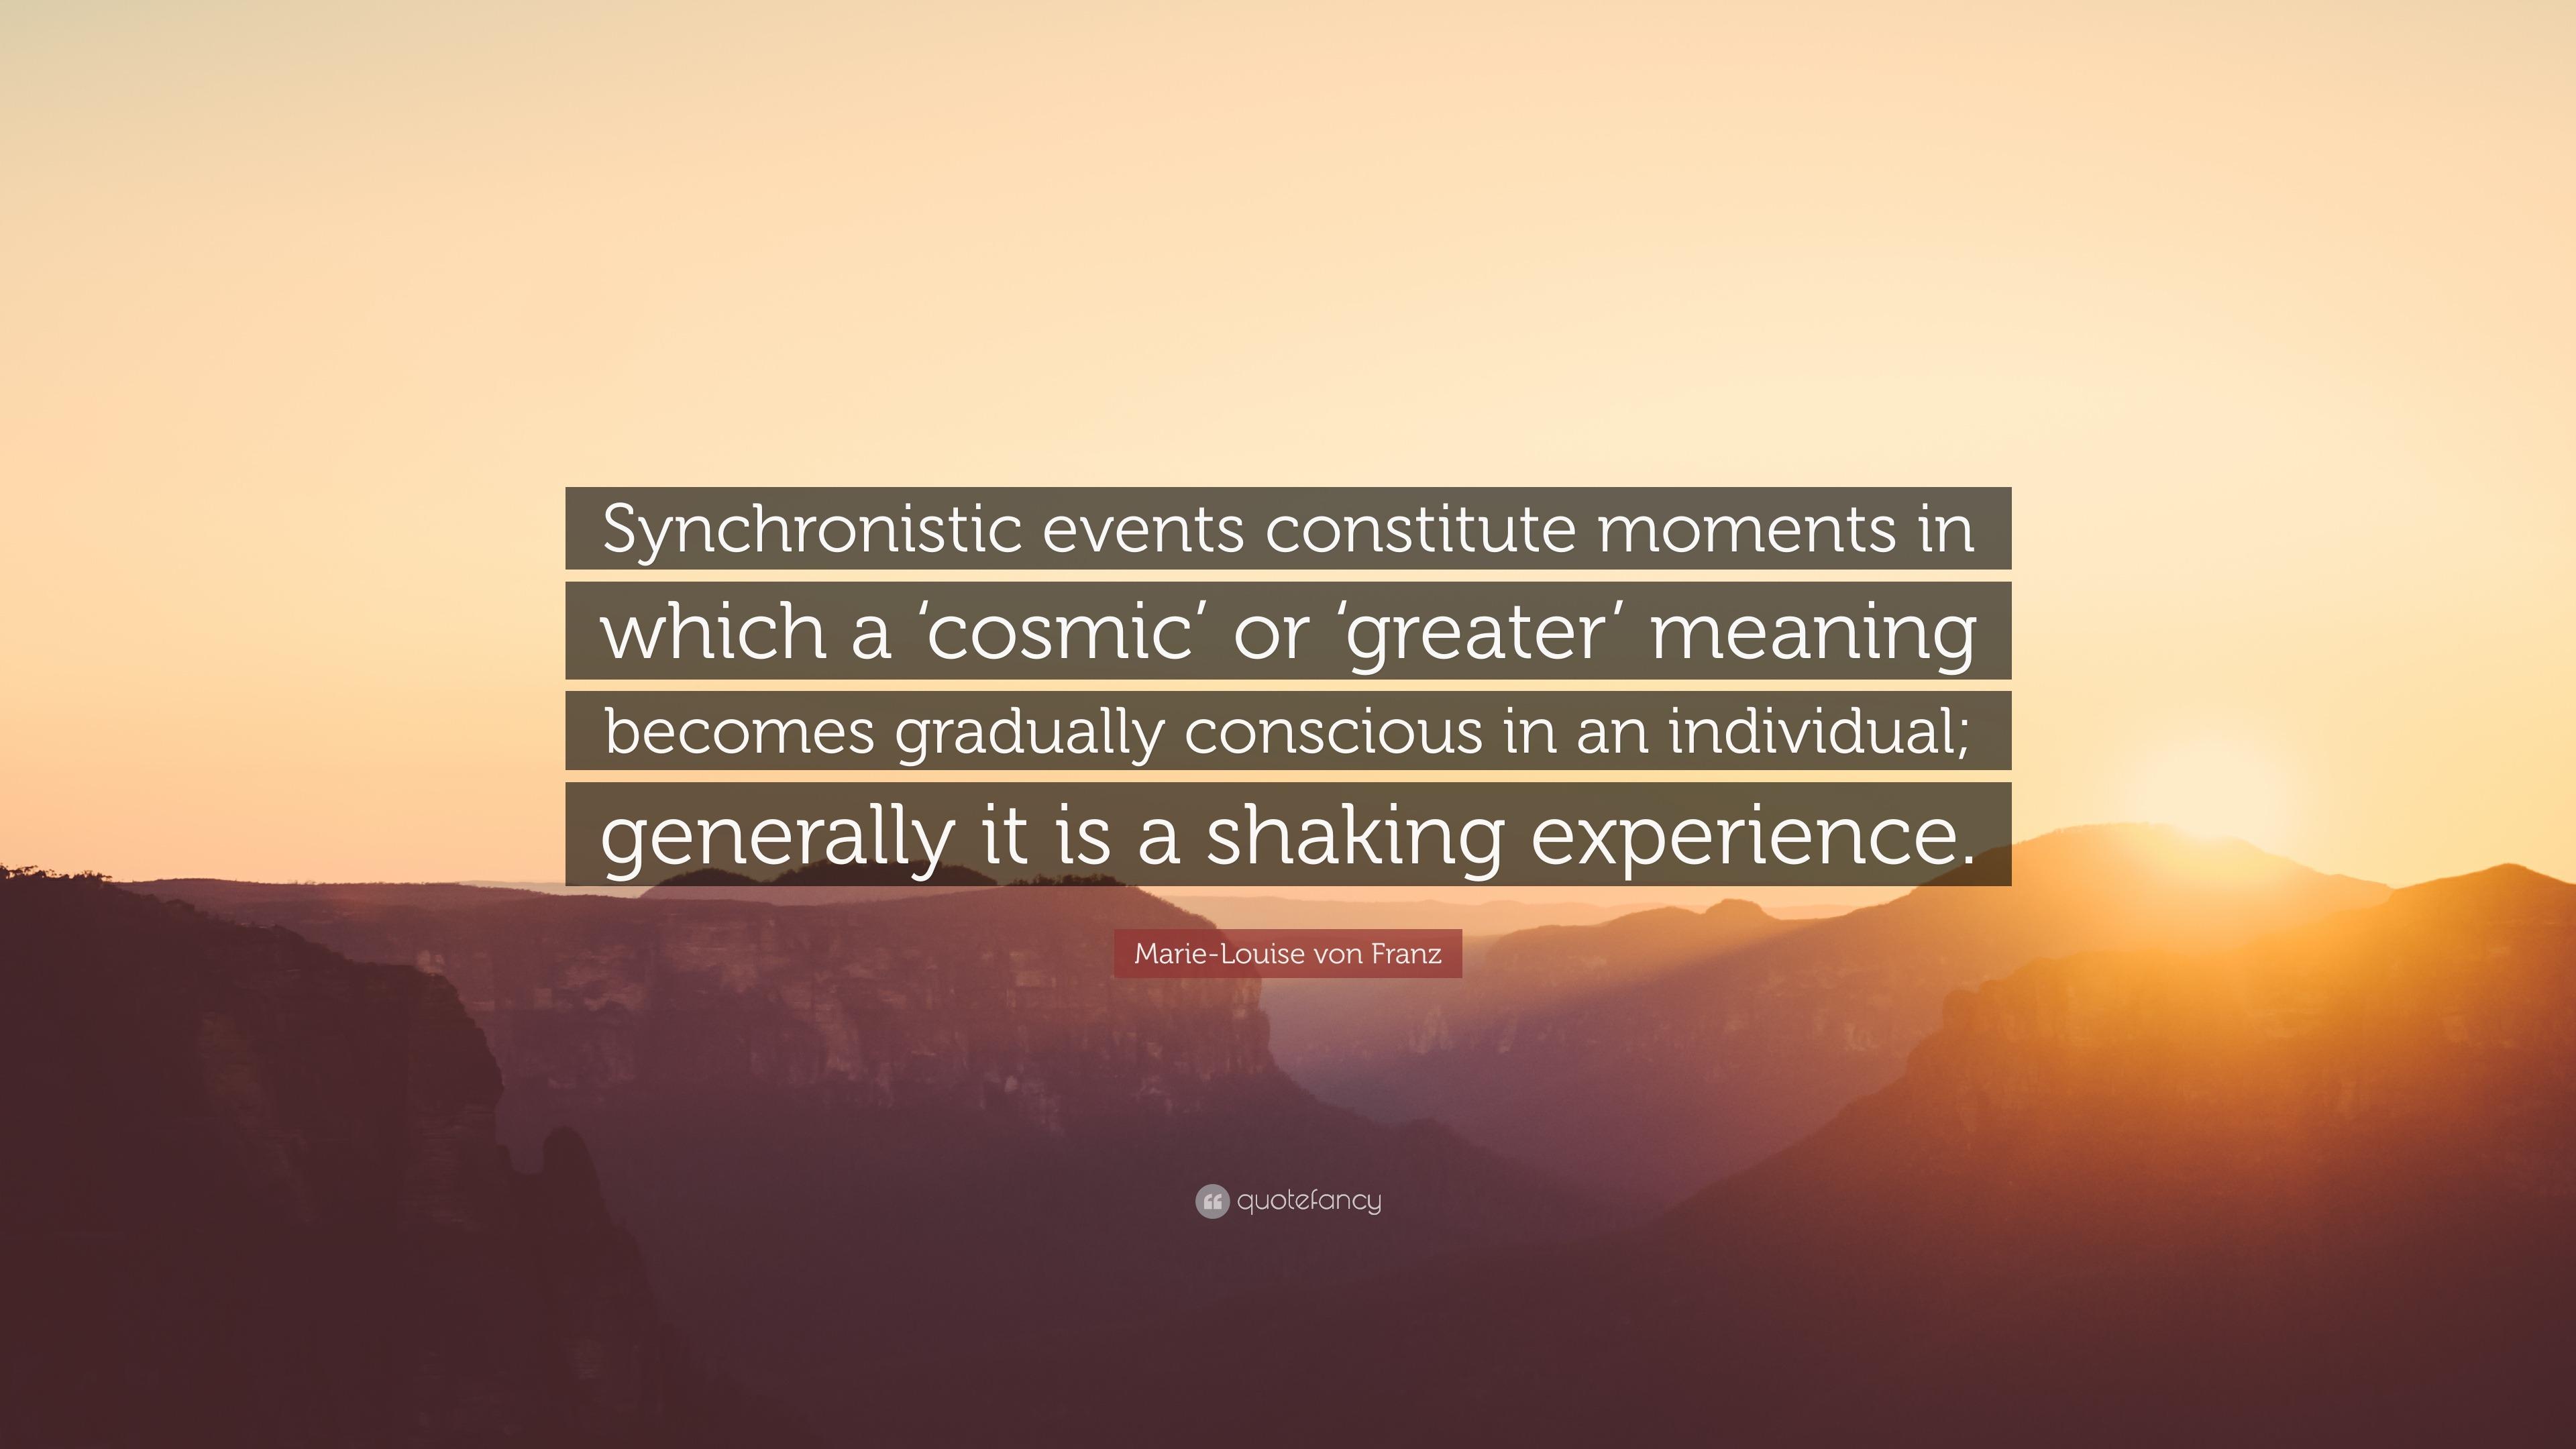 Synchronistic